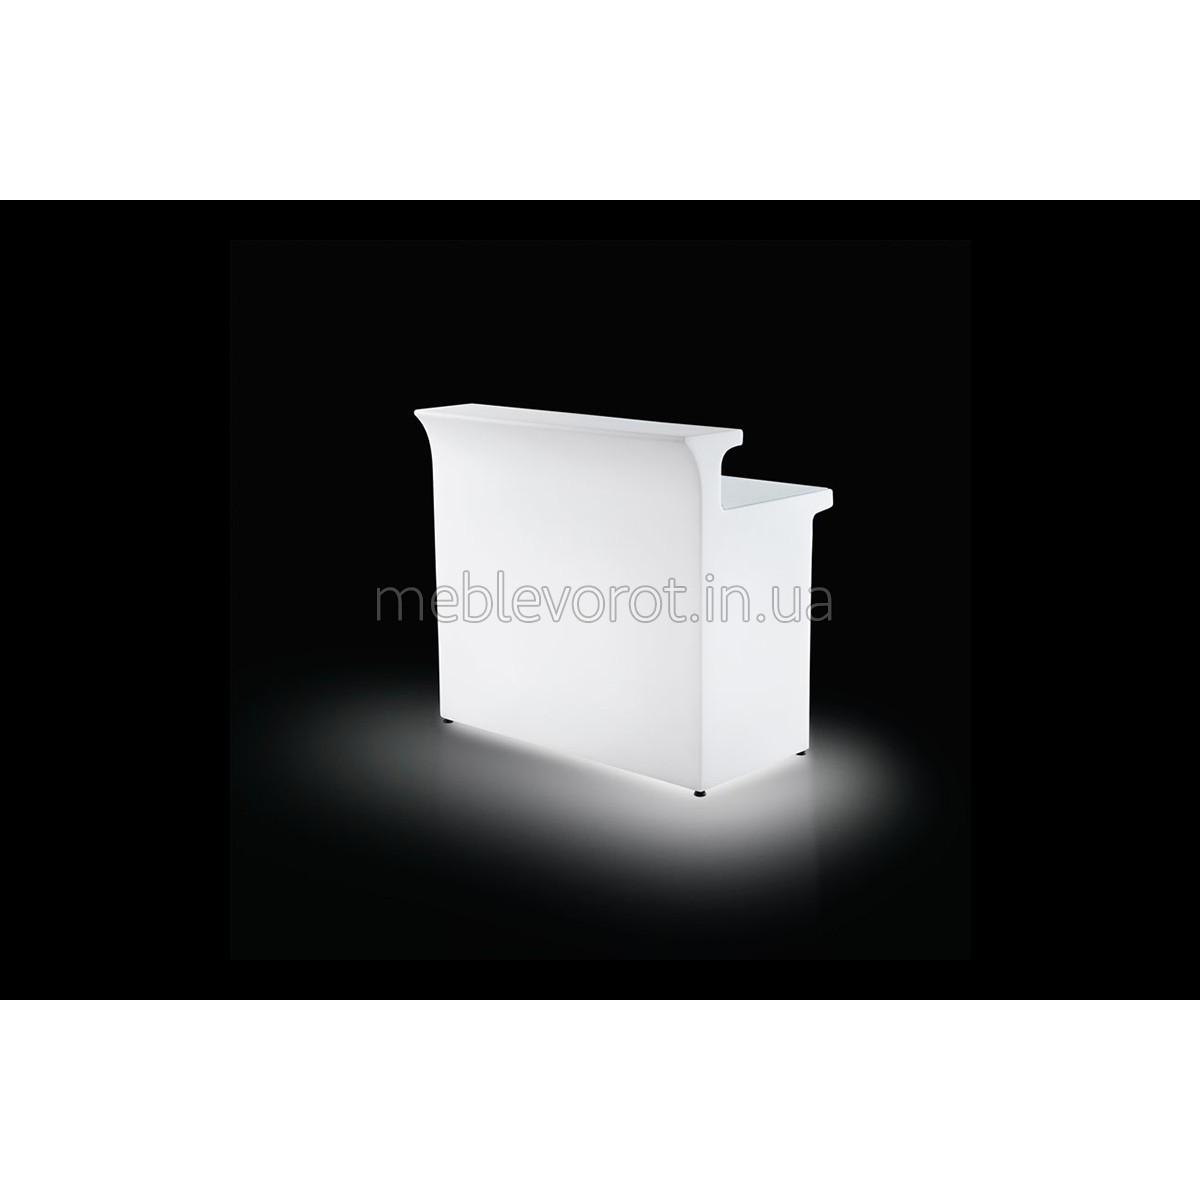 LED Стойка прямая (Аренда)